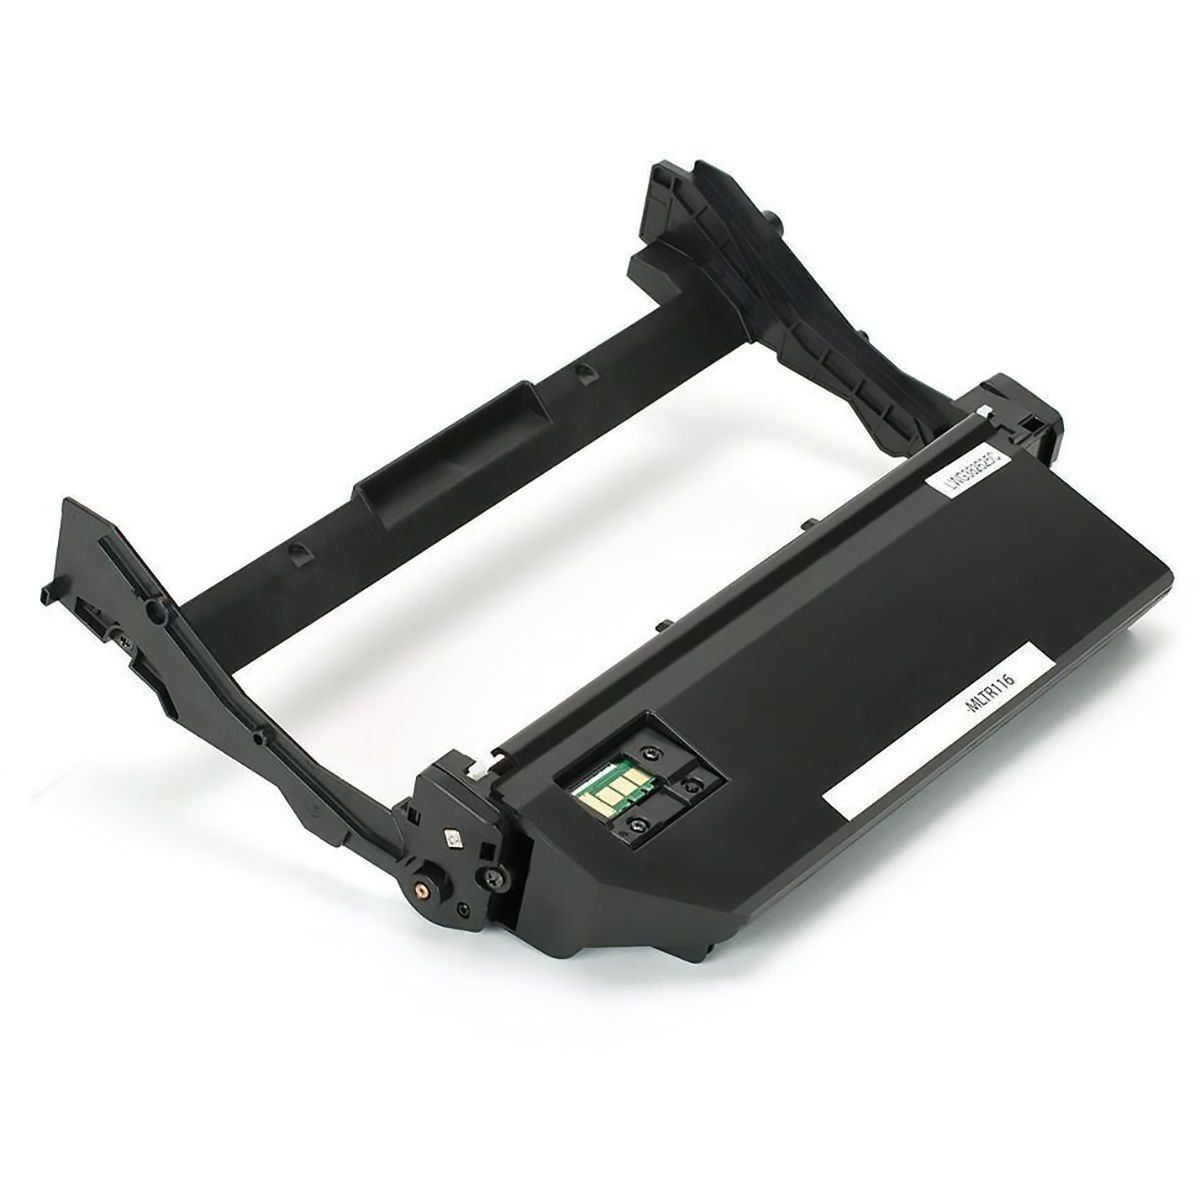 Compatível: Cartucho de Cilindro MLT-R116 para Samsung 2825dw 2835dw 2875fd 2875fw M2825 M2825n M2835dw M2875w / 9.000